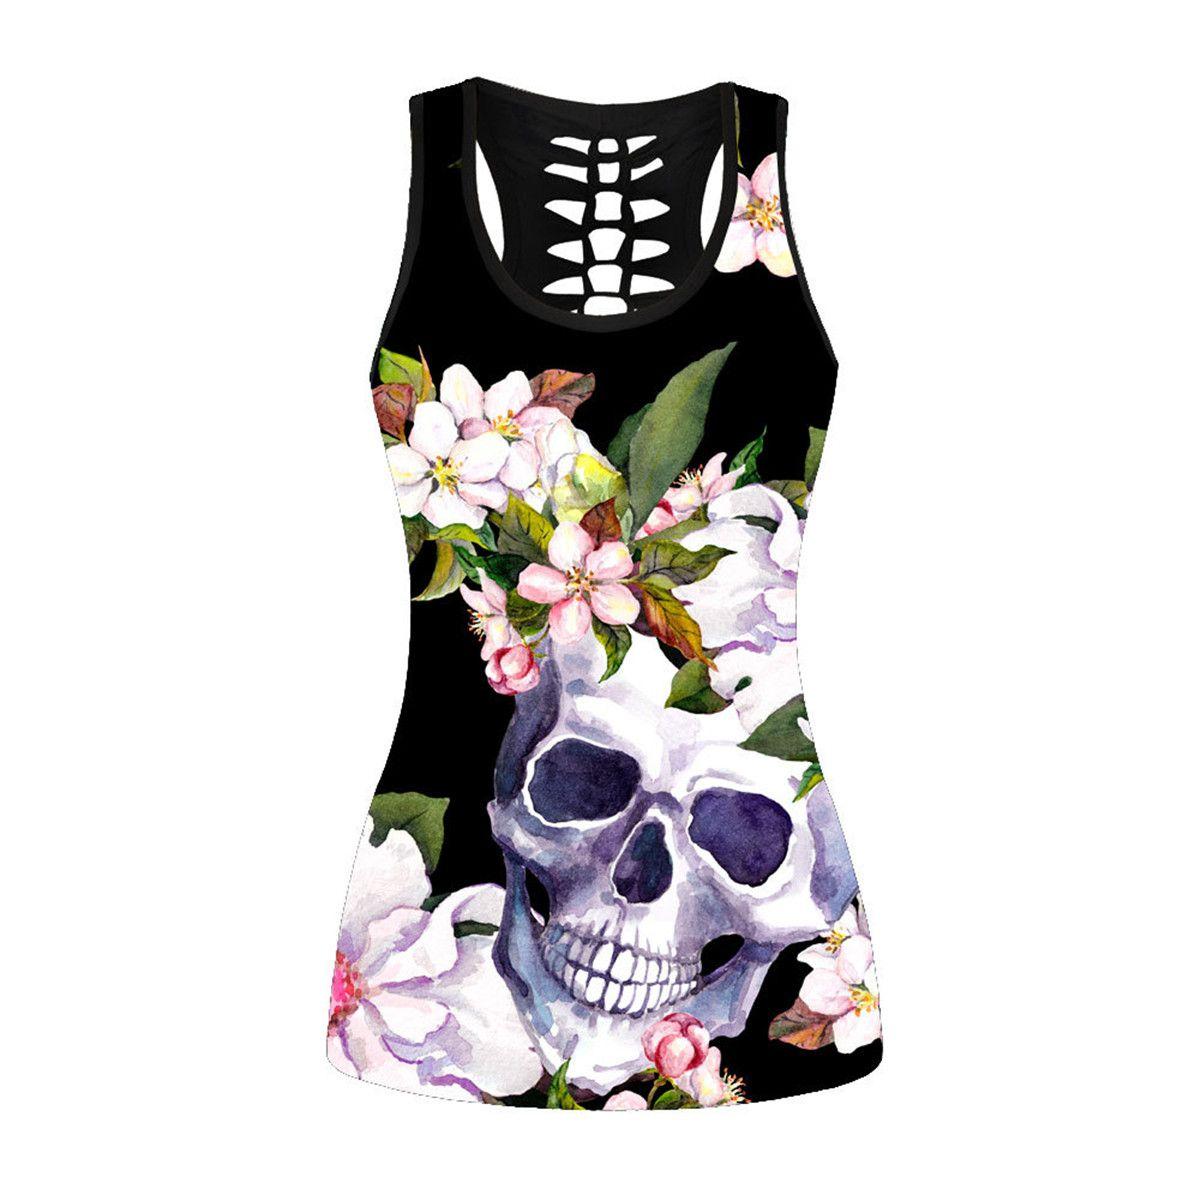 95346e5e5e96fe 3D Dark Black Tops Skull Death Skeleton Printed Women Tank Top Blusa ...